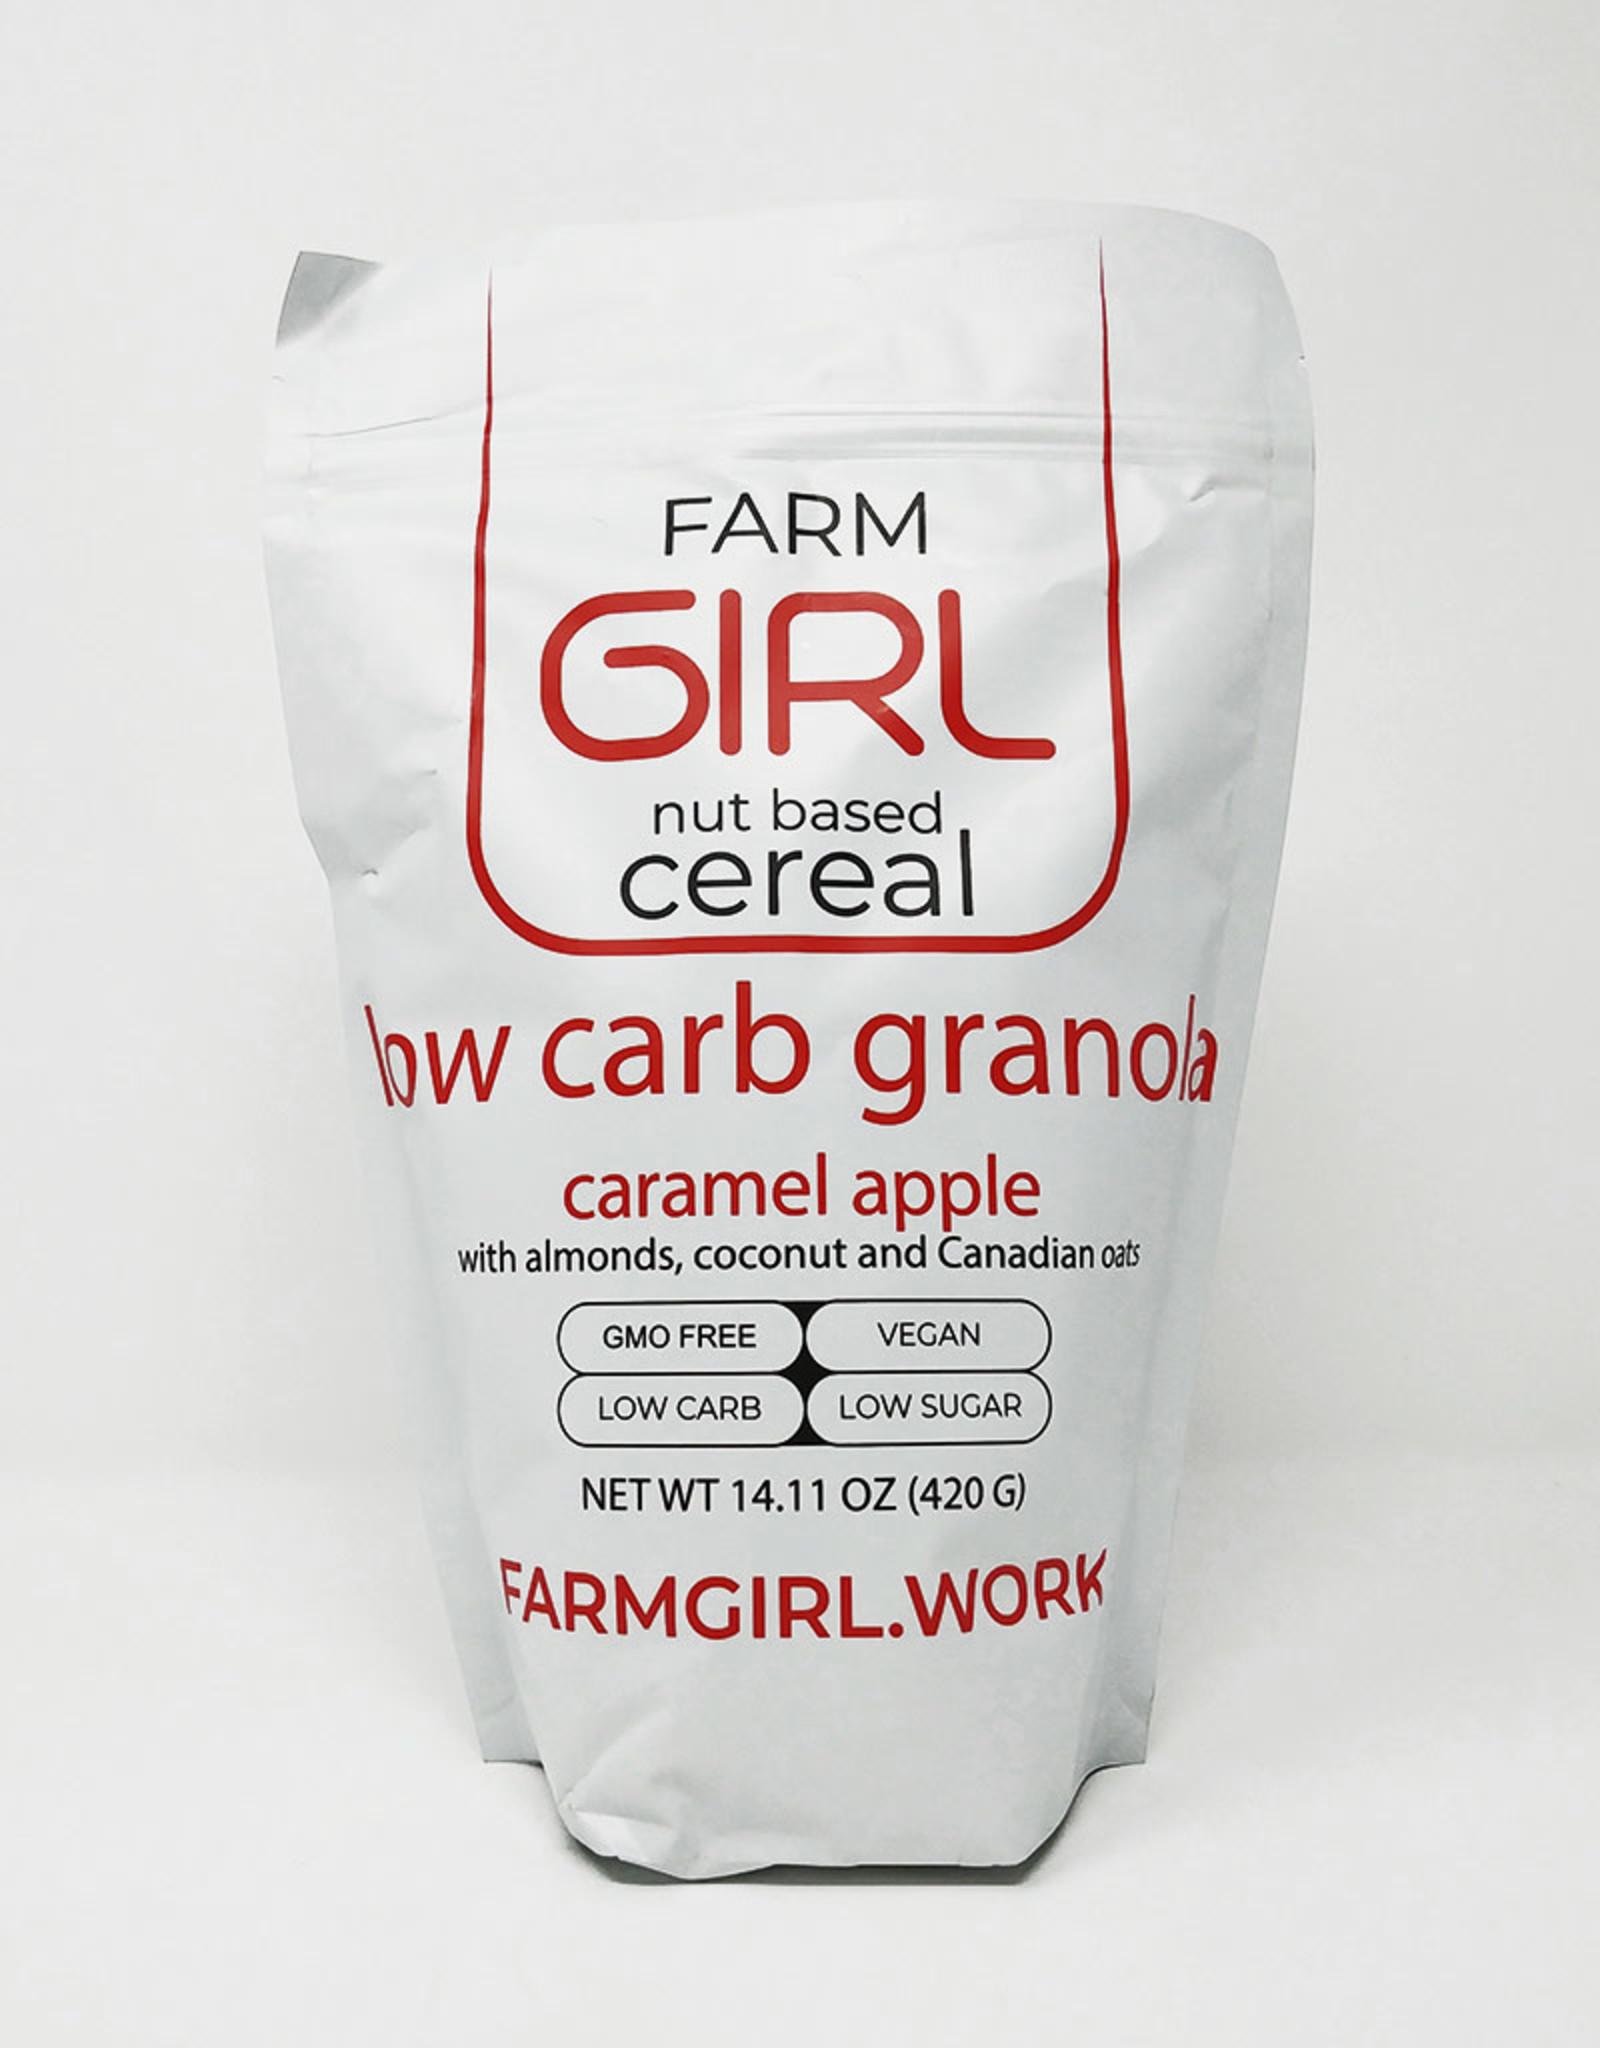 Farm Girl Farm Girl - Low Carb Granola, Caramel Apple